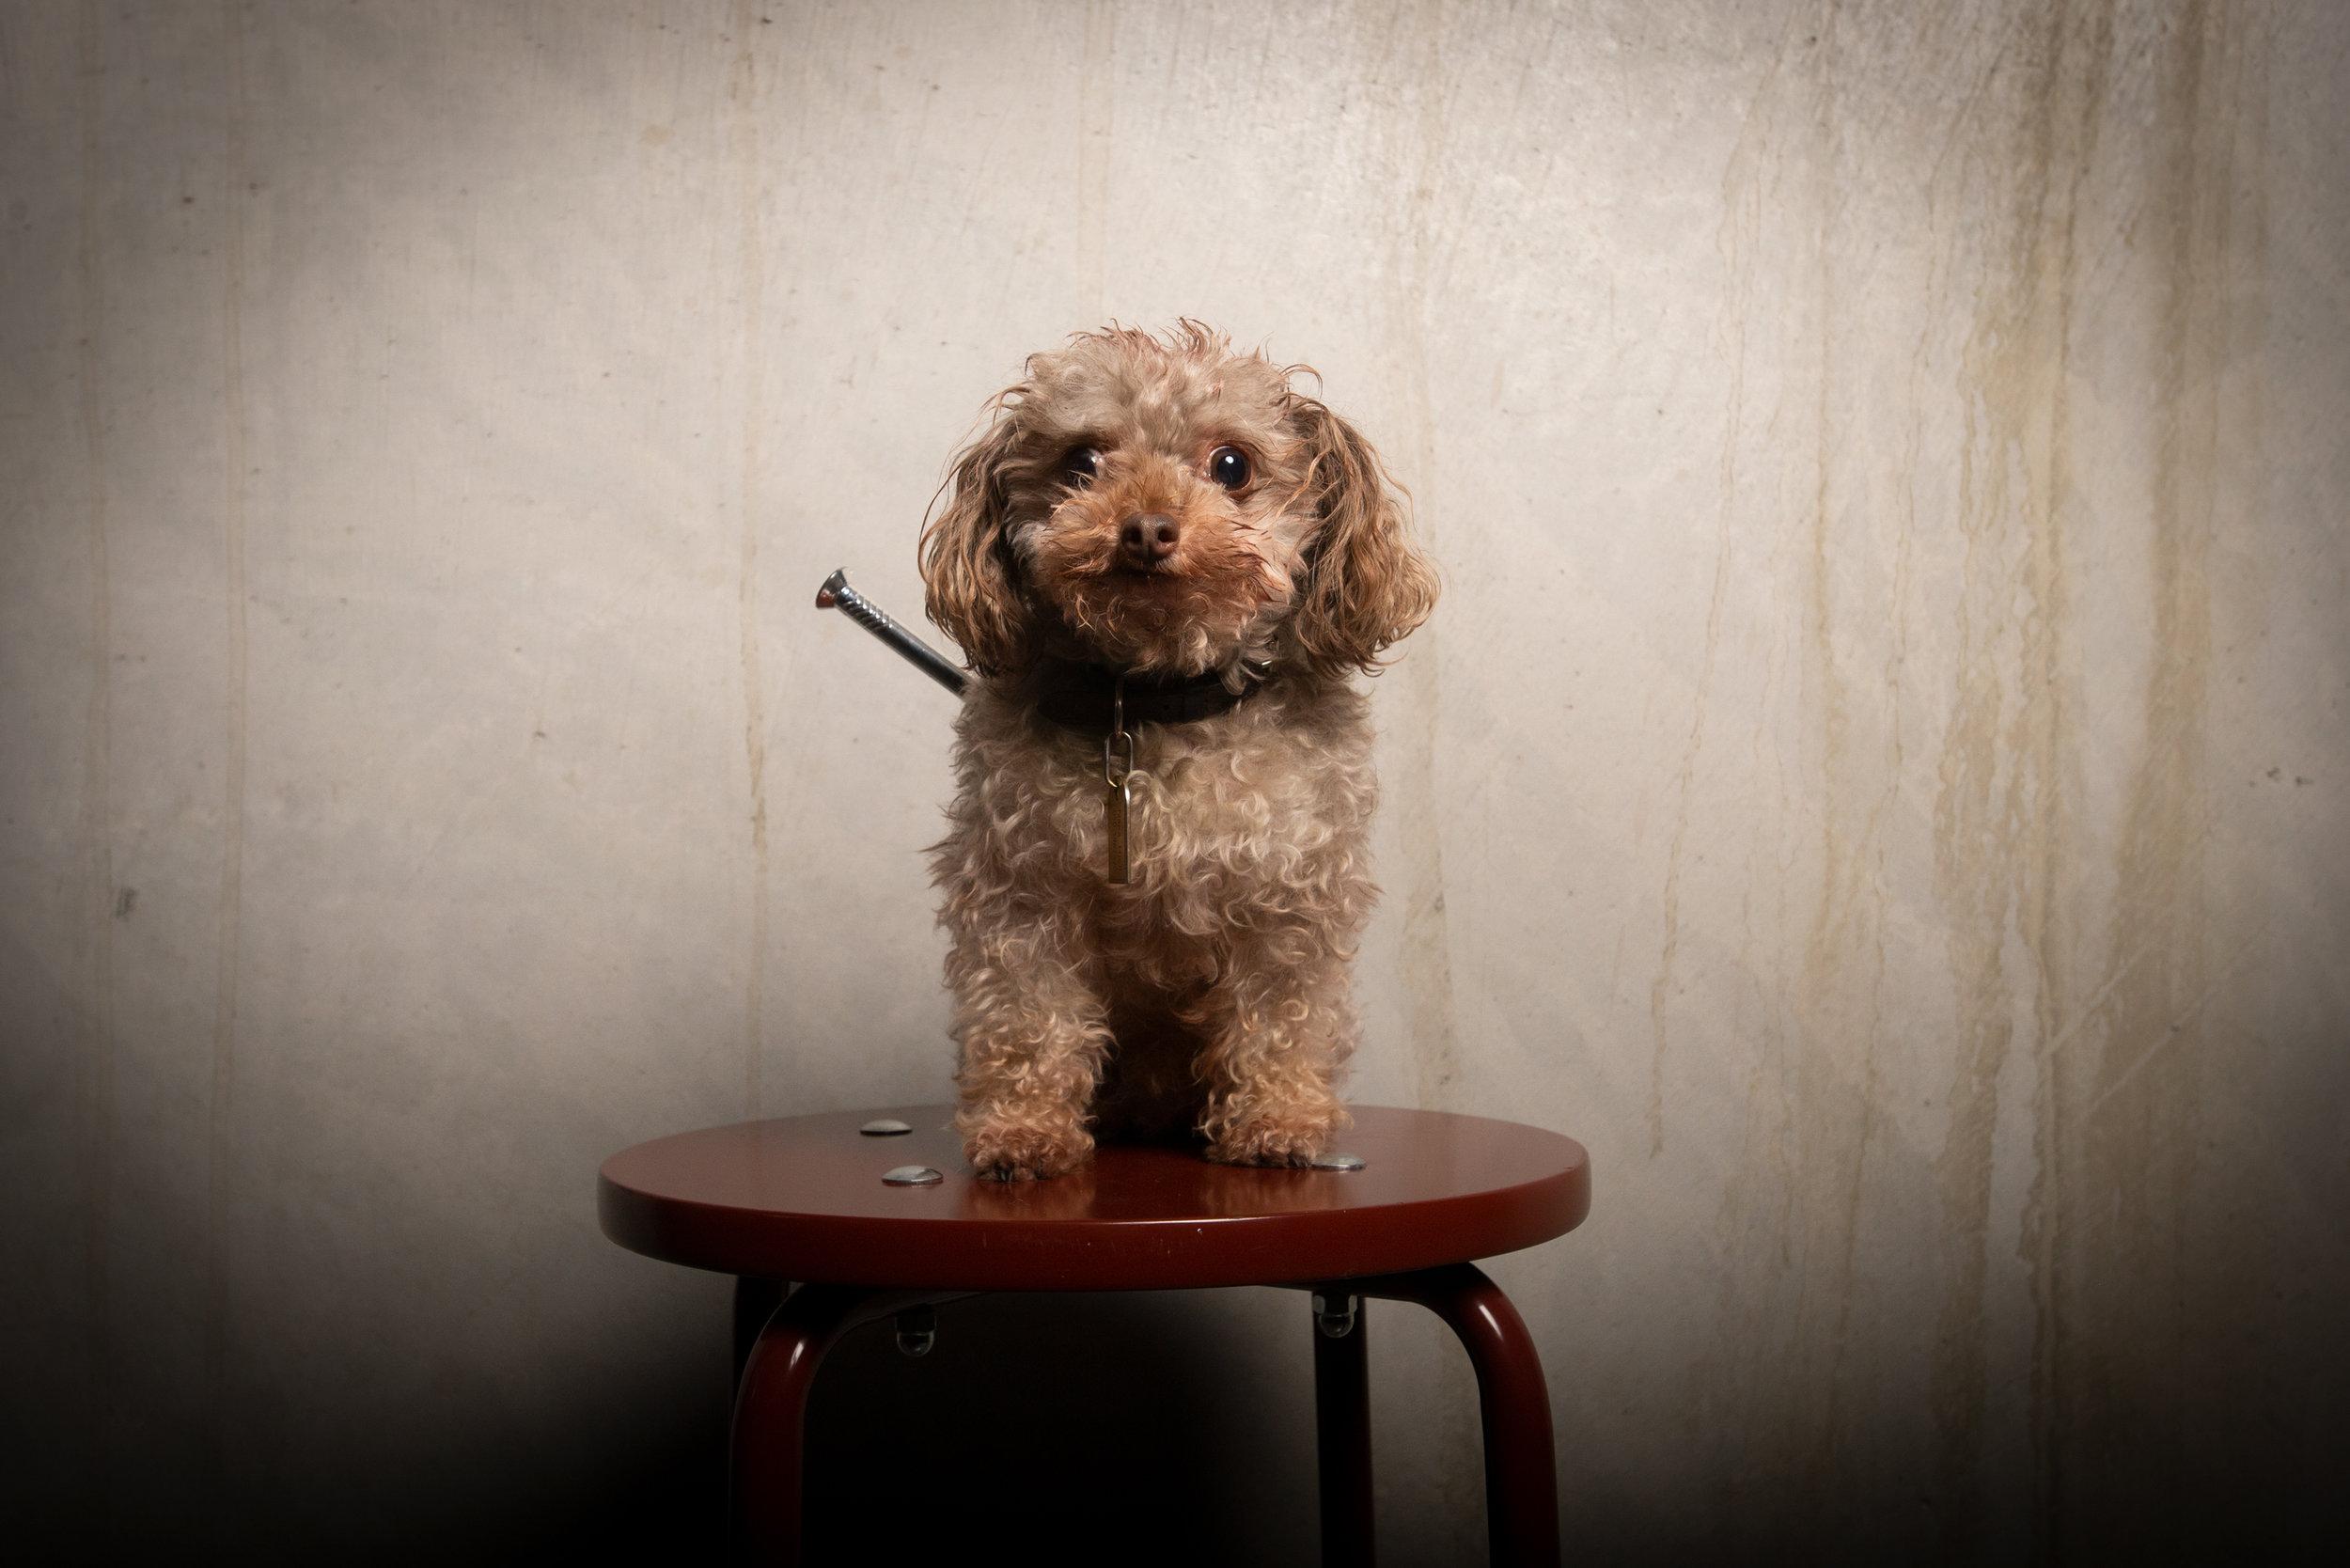 Hunden kenzo var nog helt klart kvällens gulligaste. Foto: Alexander Horn/future film.